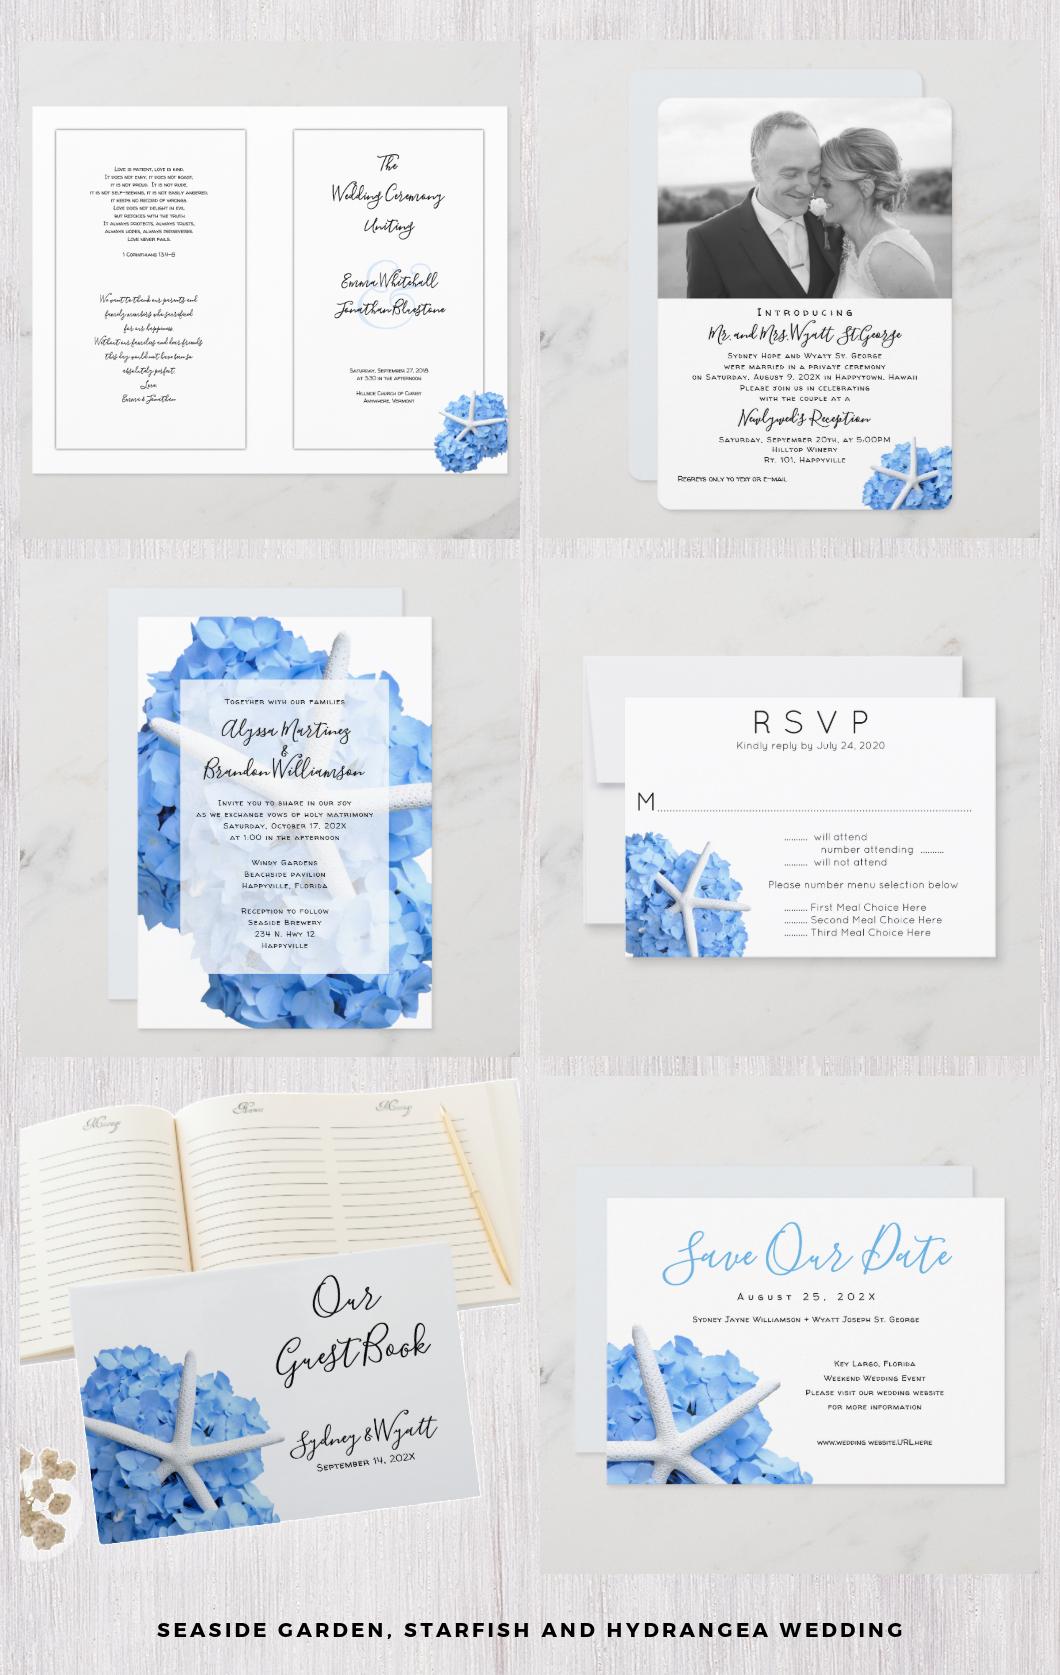 Seaside Garden blue hydrangea wedding with starfish